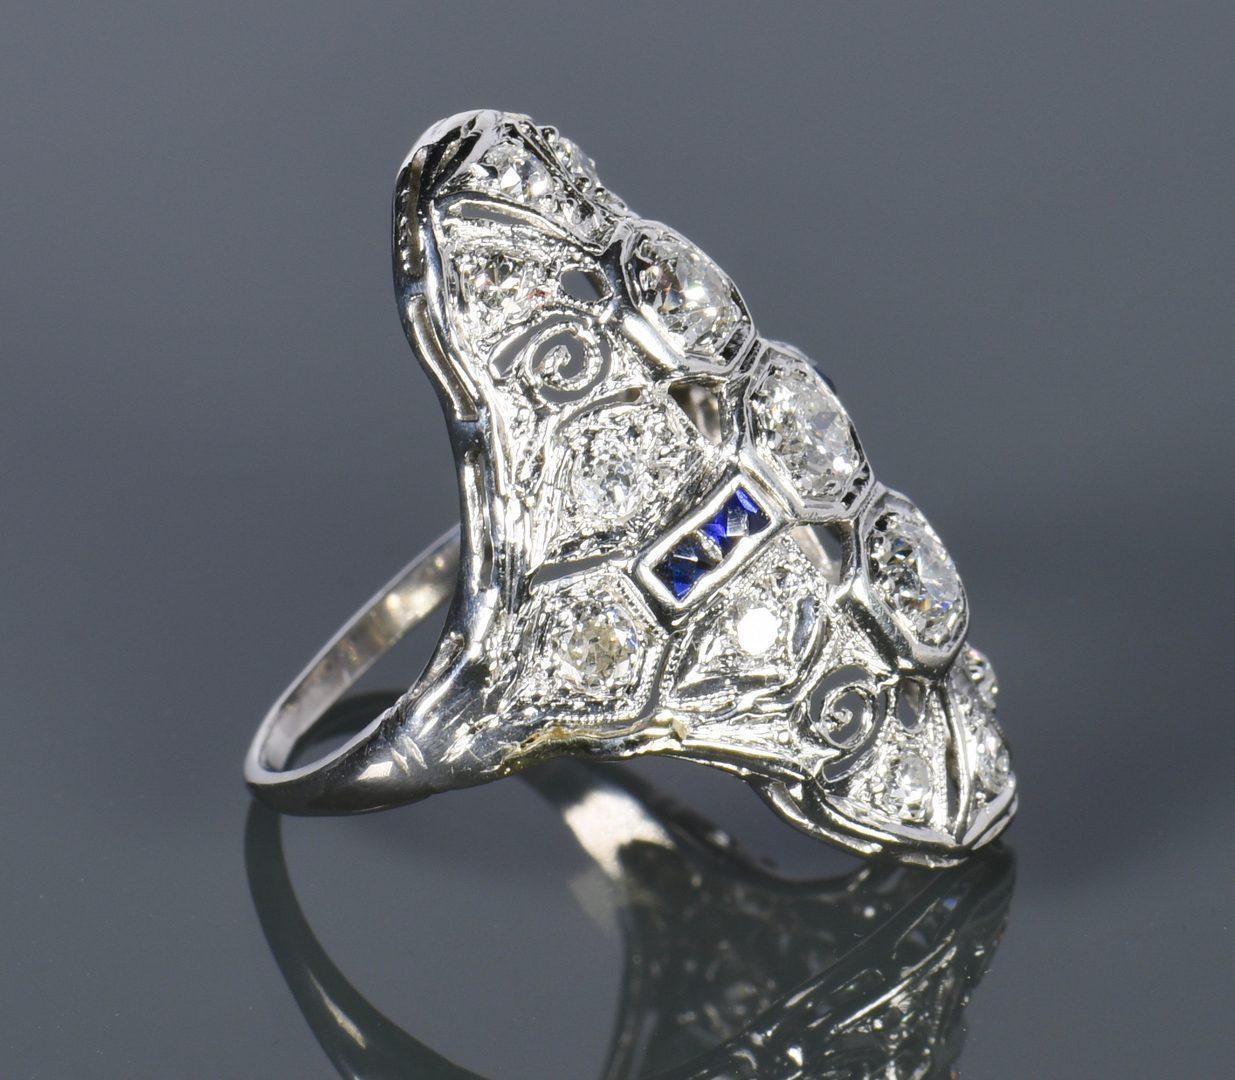 Lot 805: Art Deco Diamond and Sapphire Ring